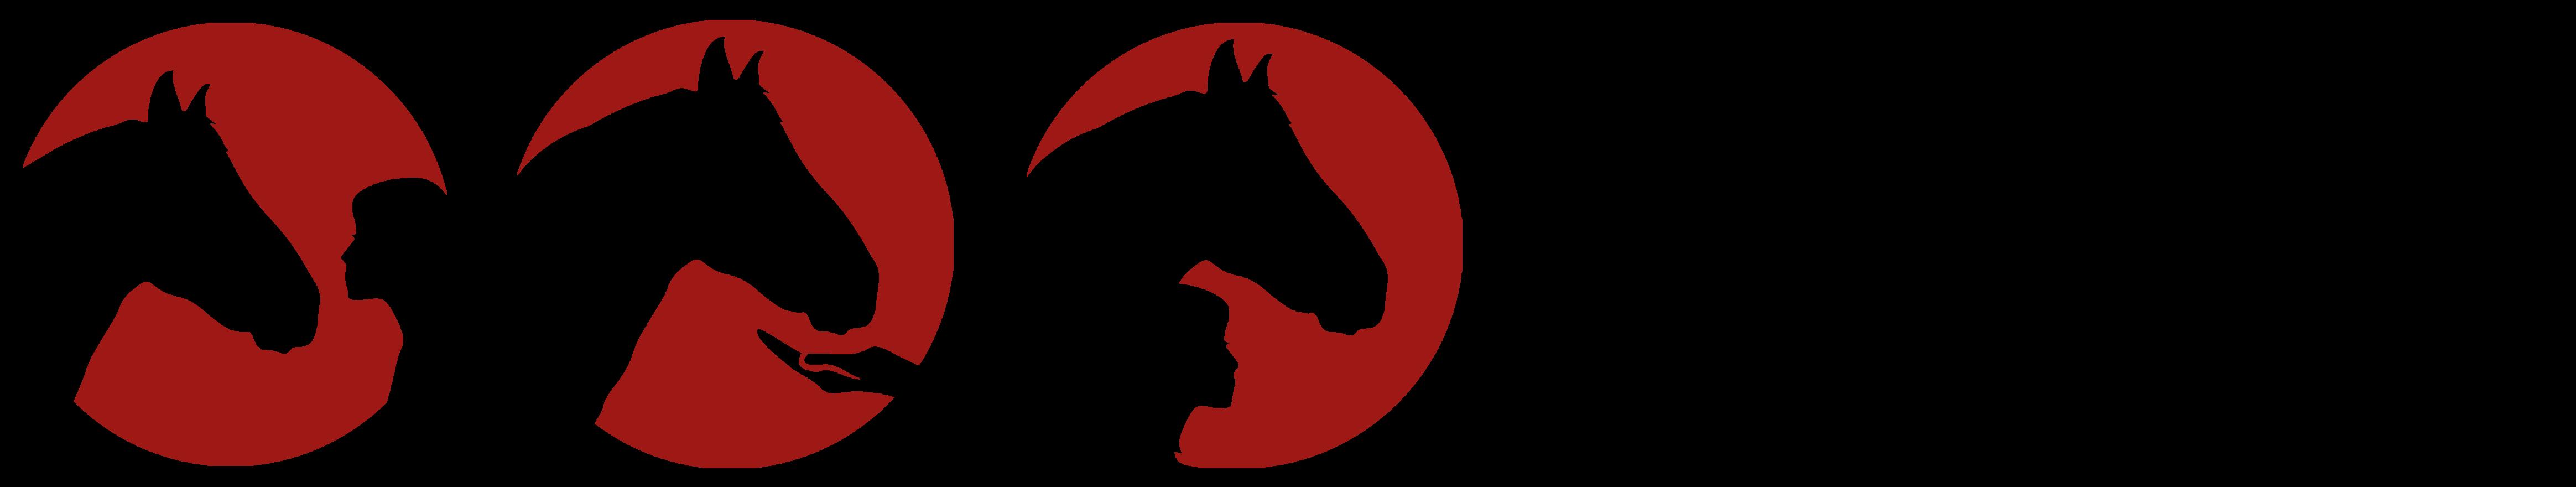 mobile logo Coaching mit Pferden Harz